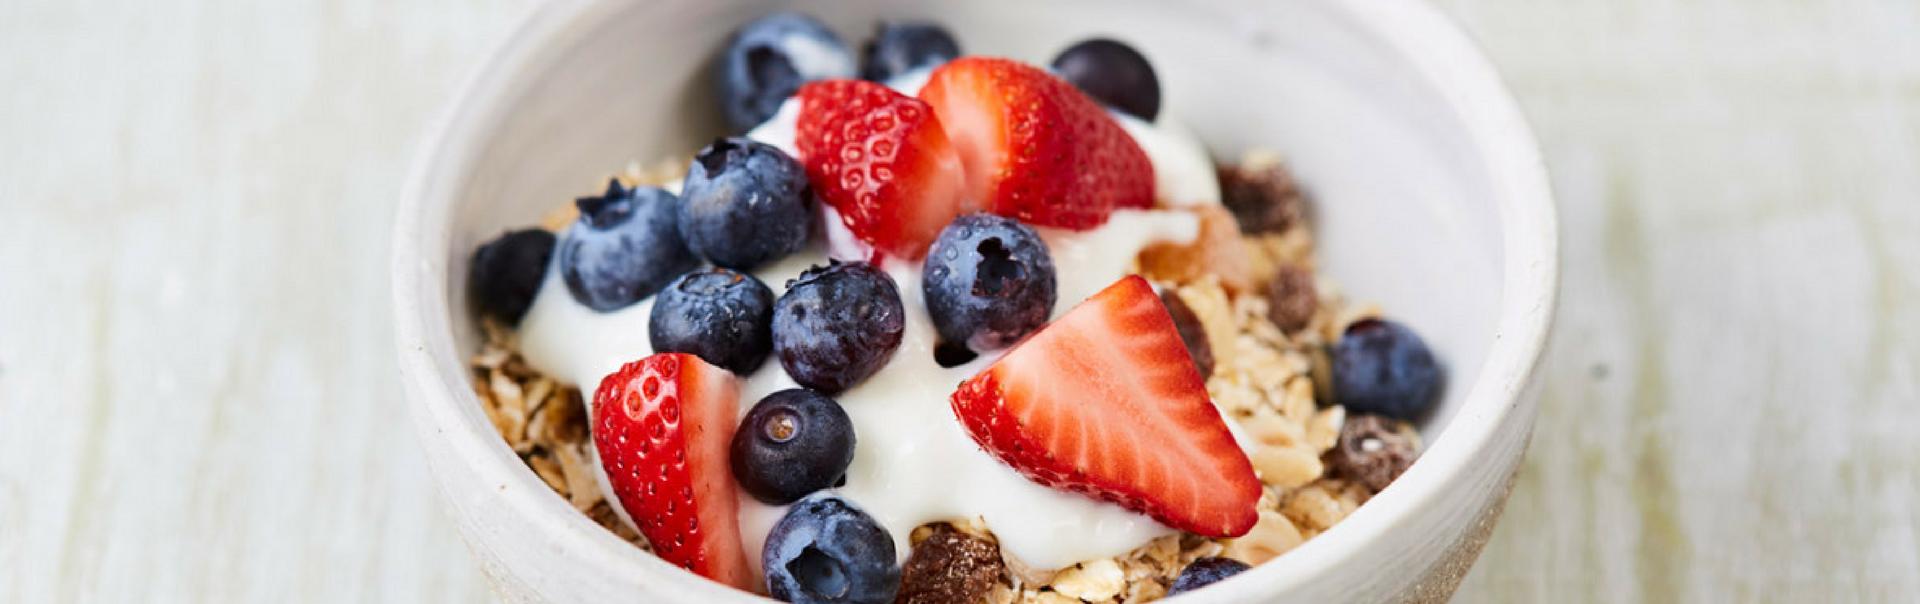 oaty fruity cereal